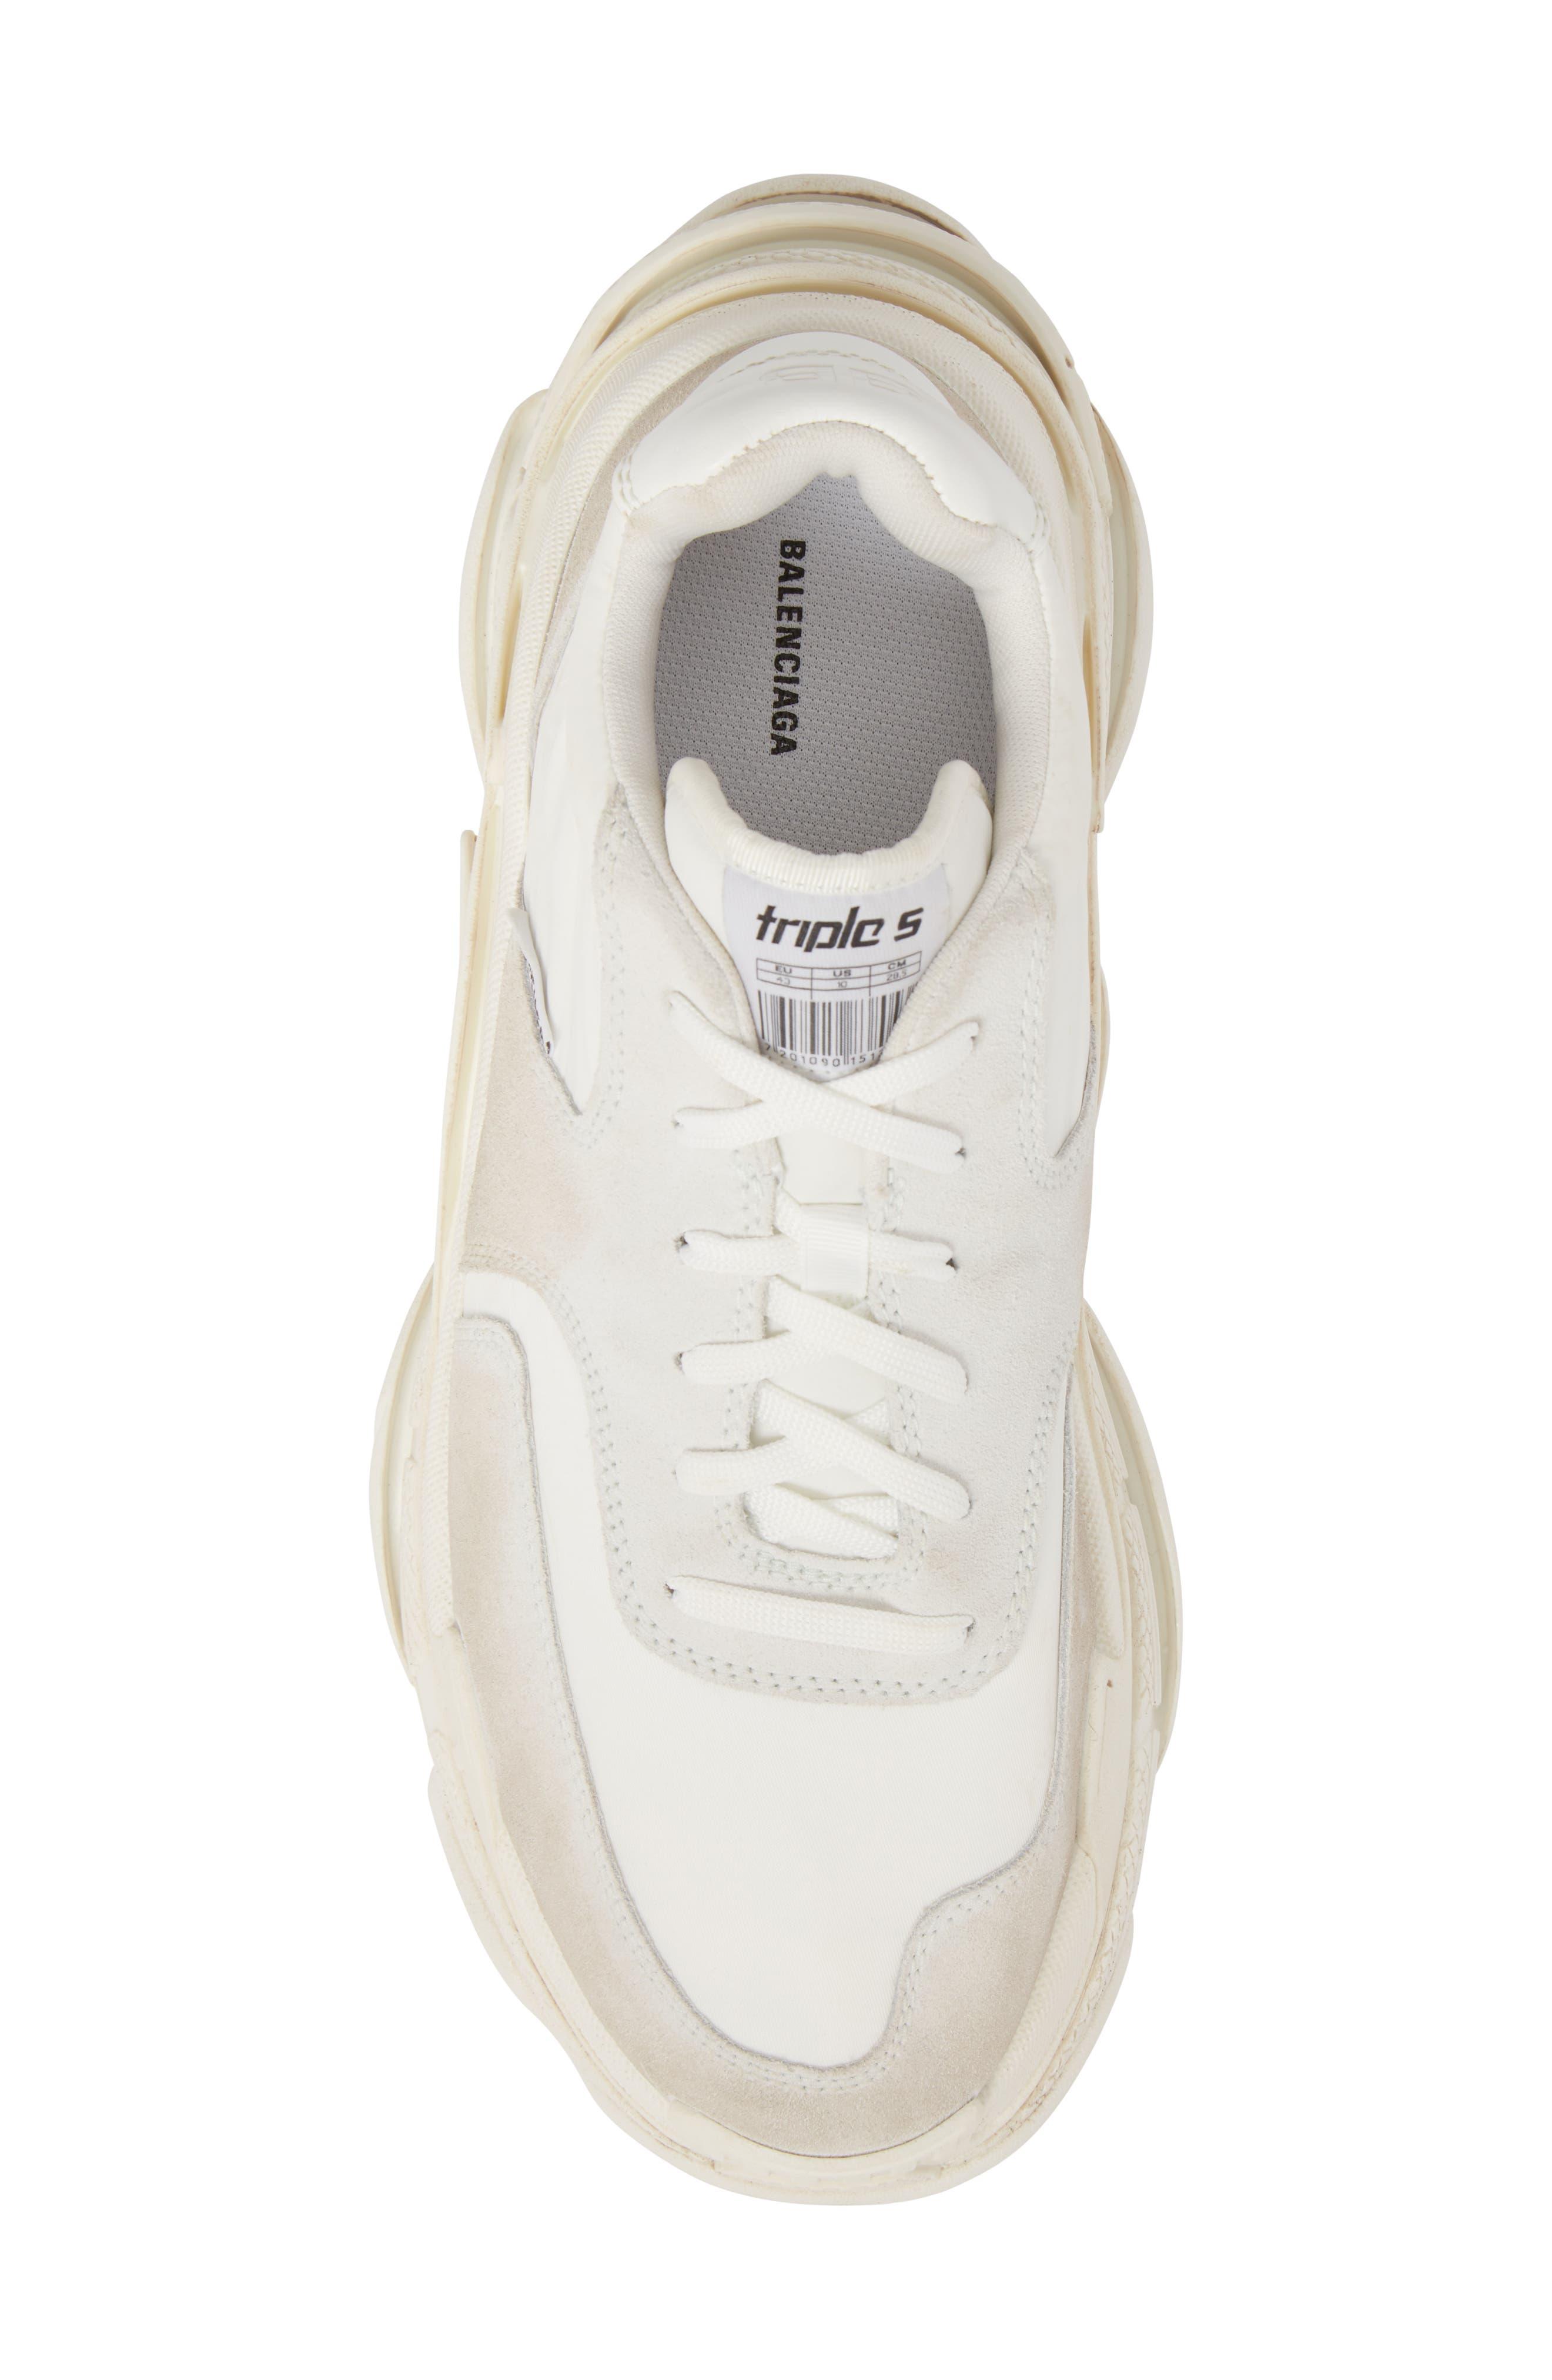 Triple S Retro Sneaker,                             Alternate thumbnail 5, color,                             Blanc White